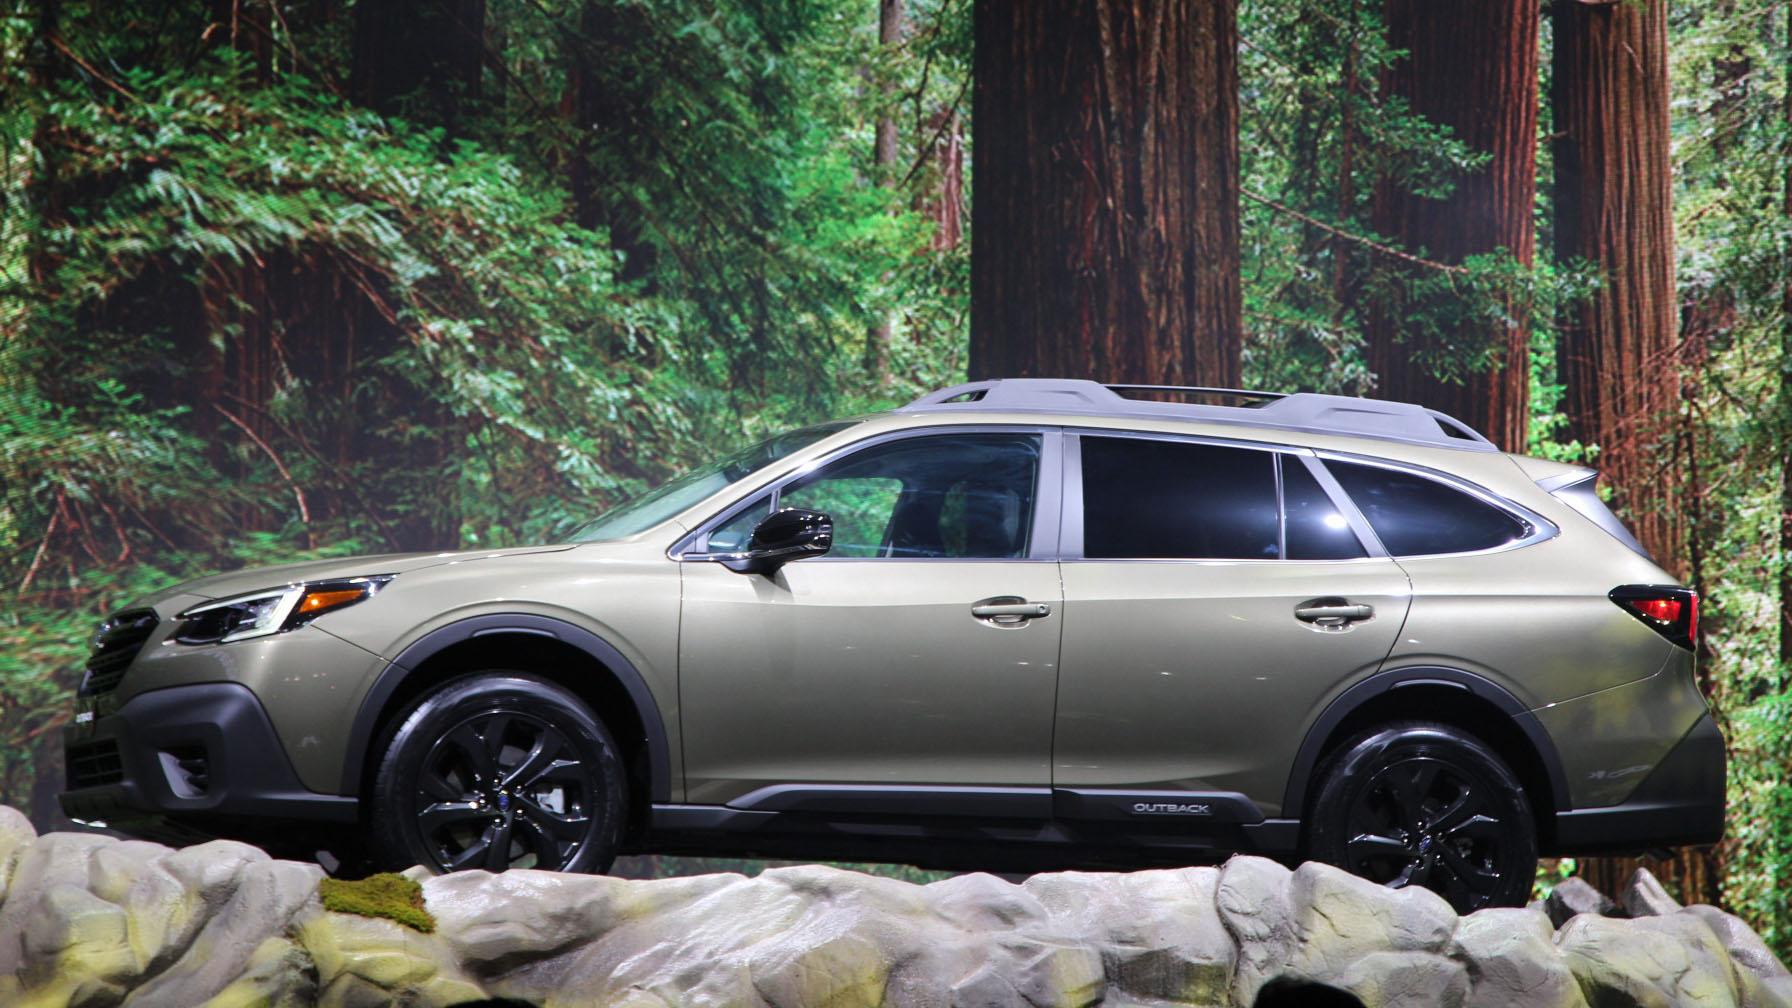 Bmw Mountain View >> 2020 Subaru Outback unveiled: Australian launch late 2019 ...